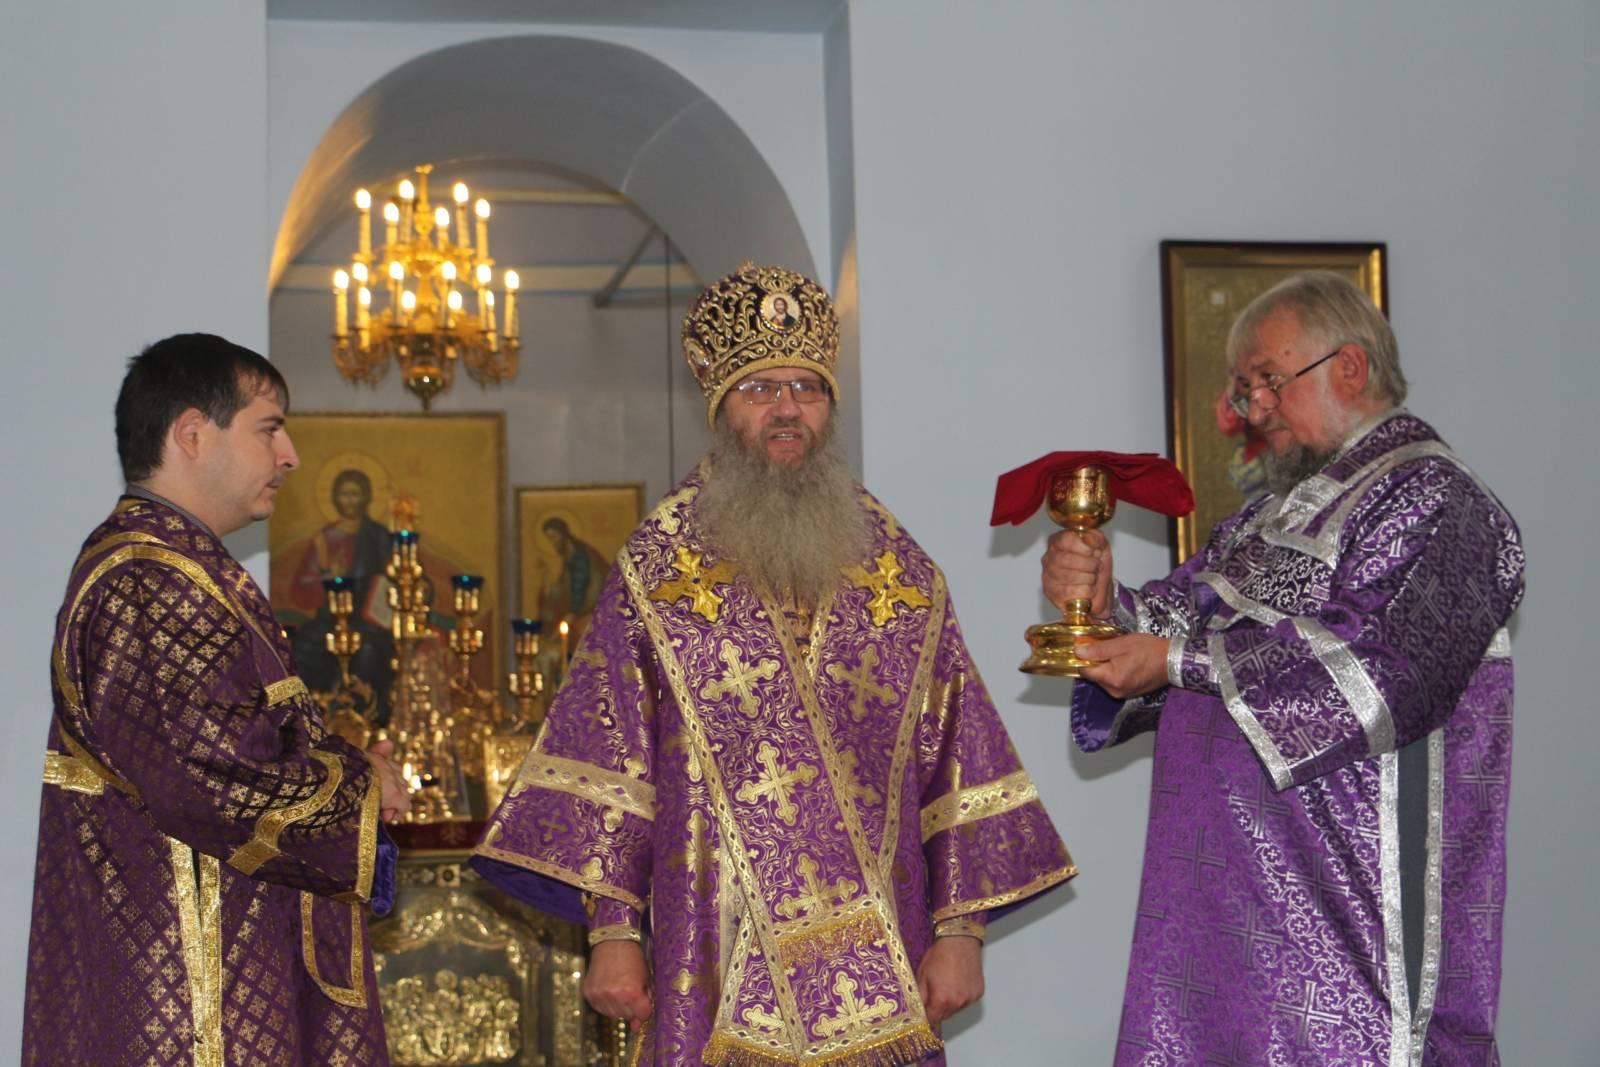 В Попразднство Воздви́жения Честно́го и Животворящего Креста Господня.